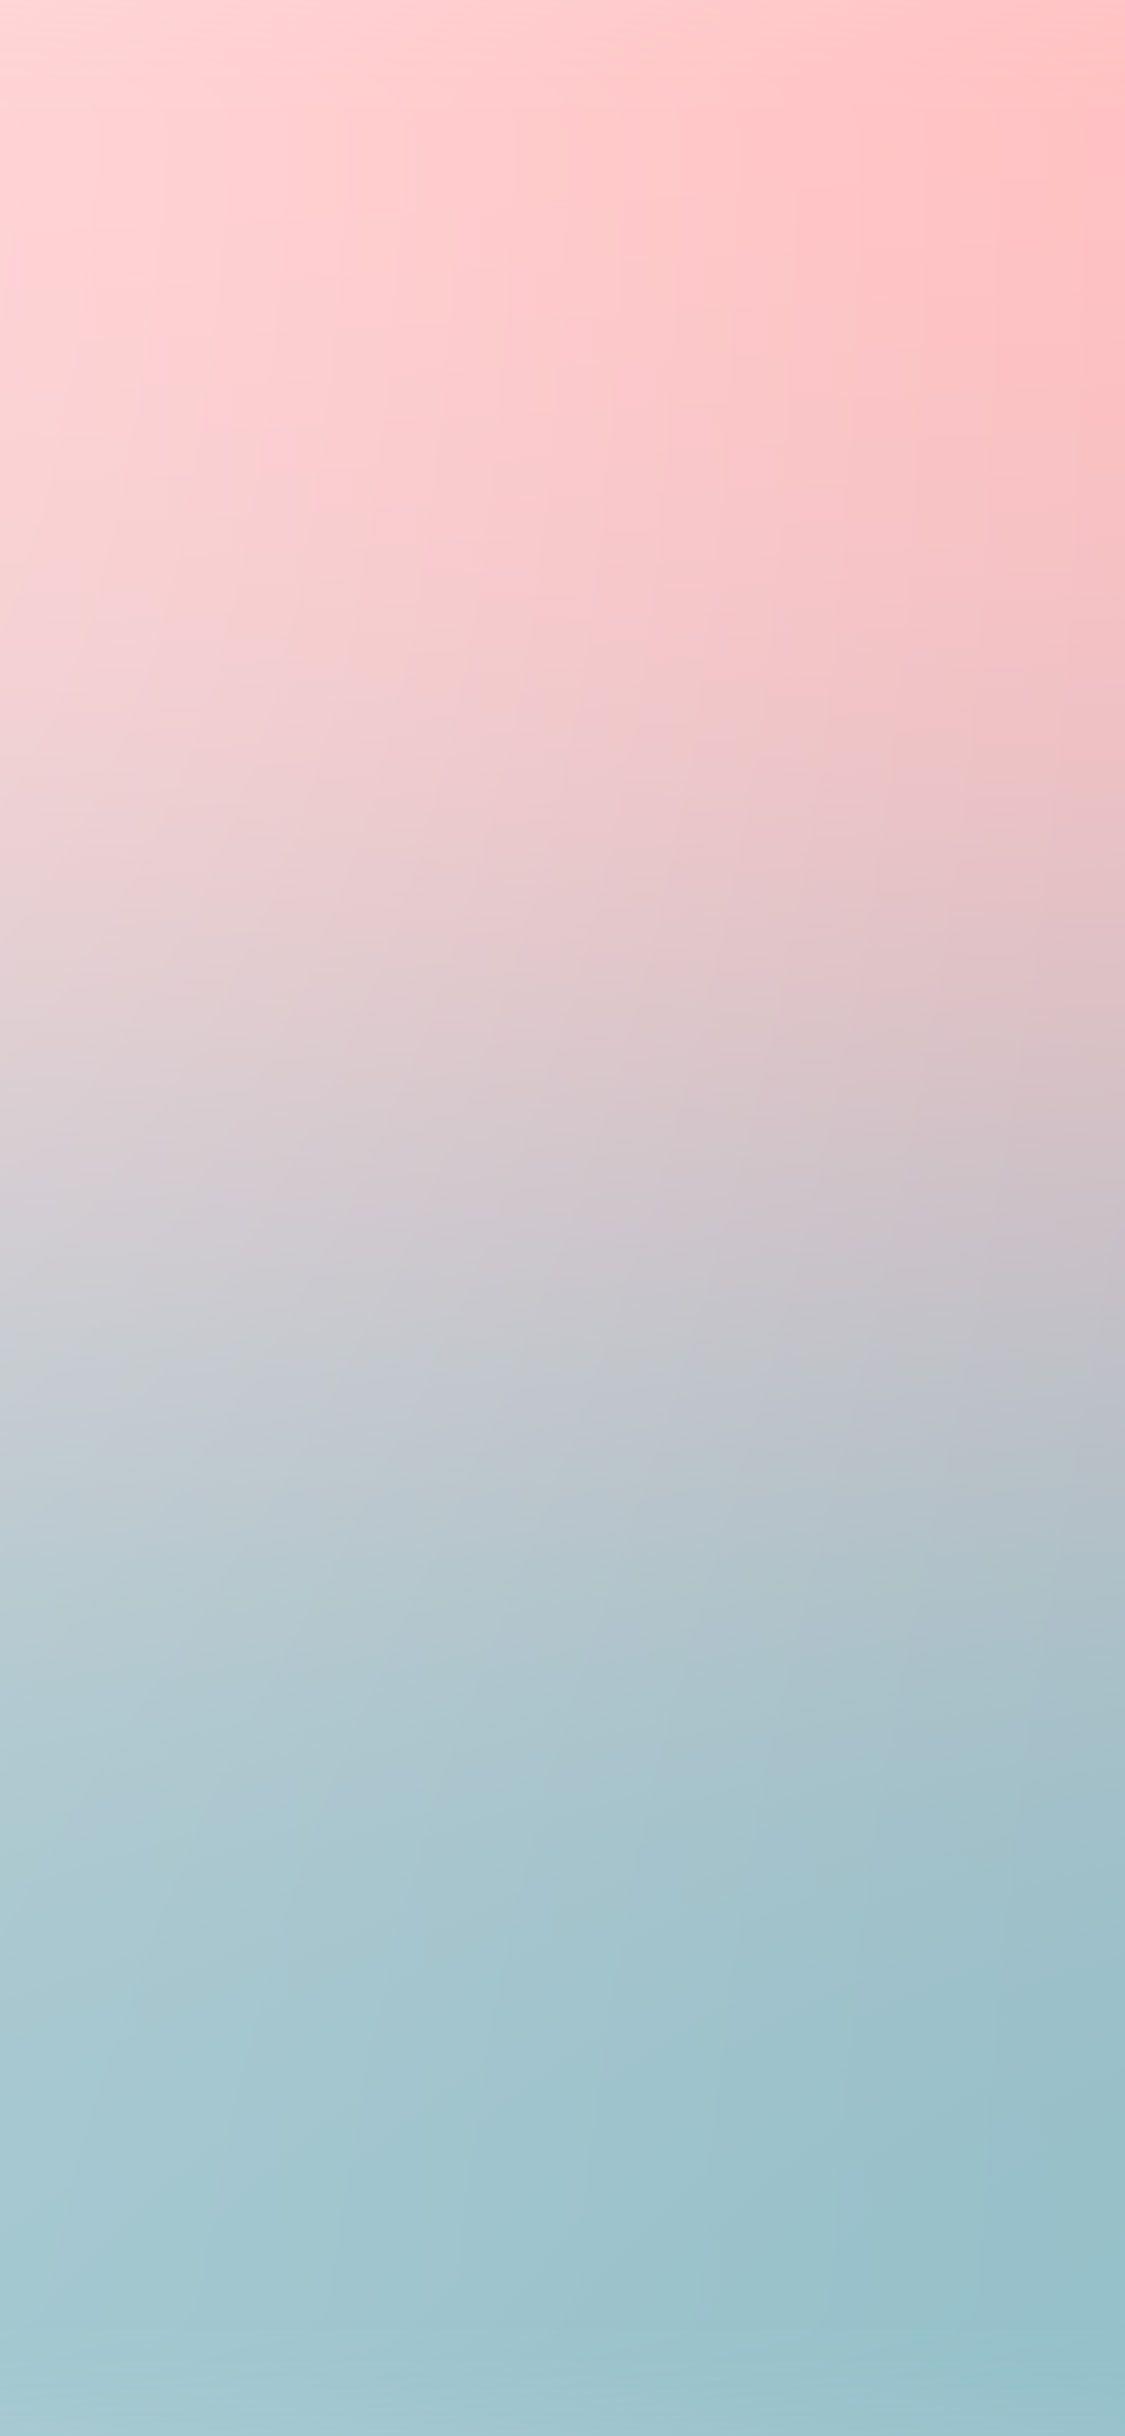 Gradient Wallpaper Iphone X , HD Wallpaper & Backgrounds